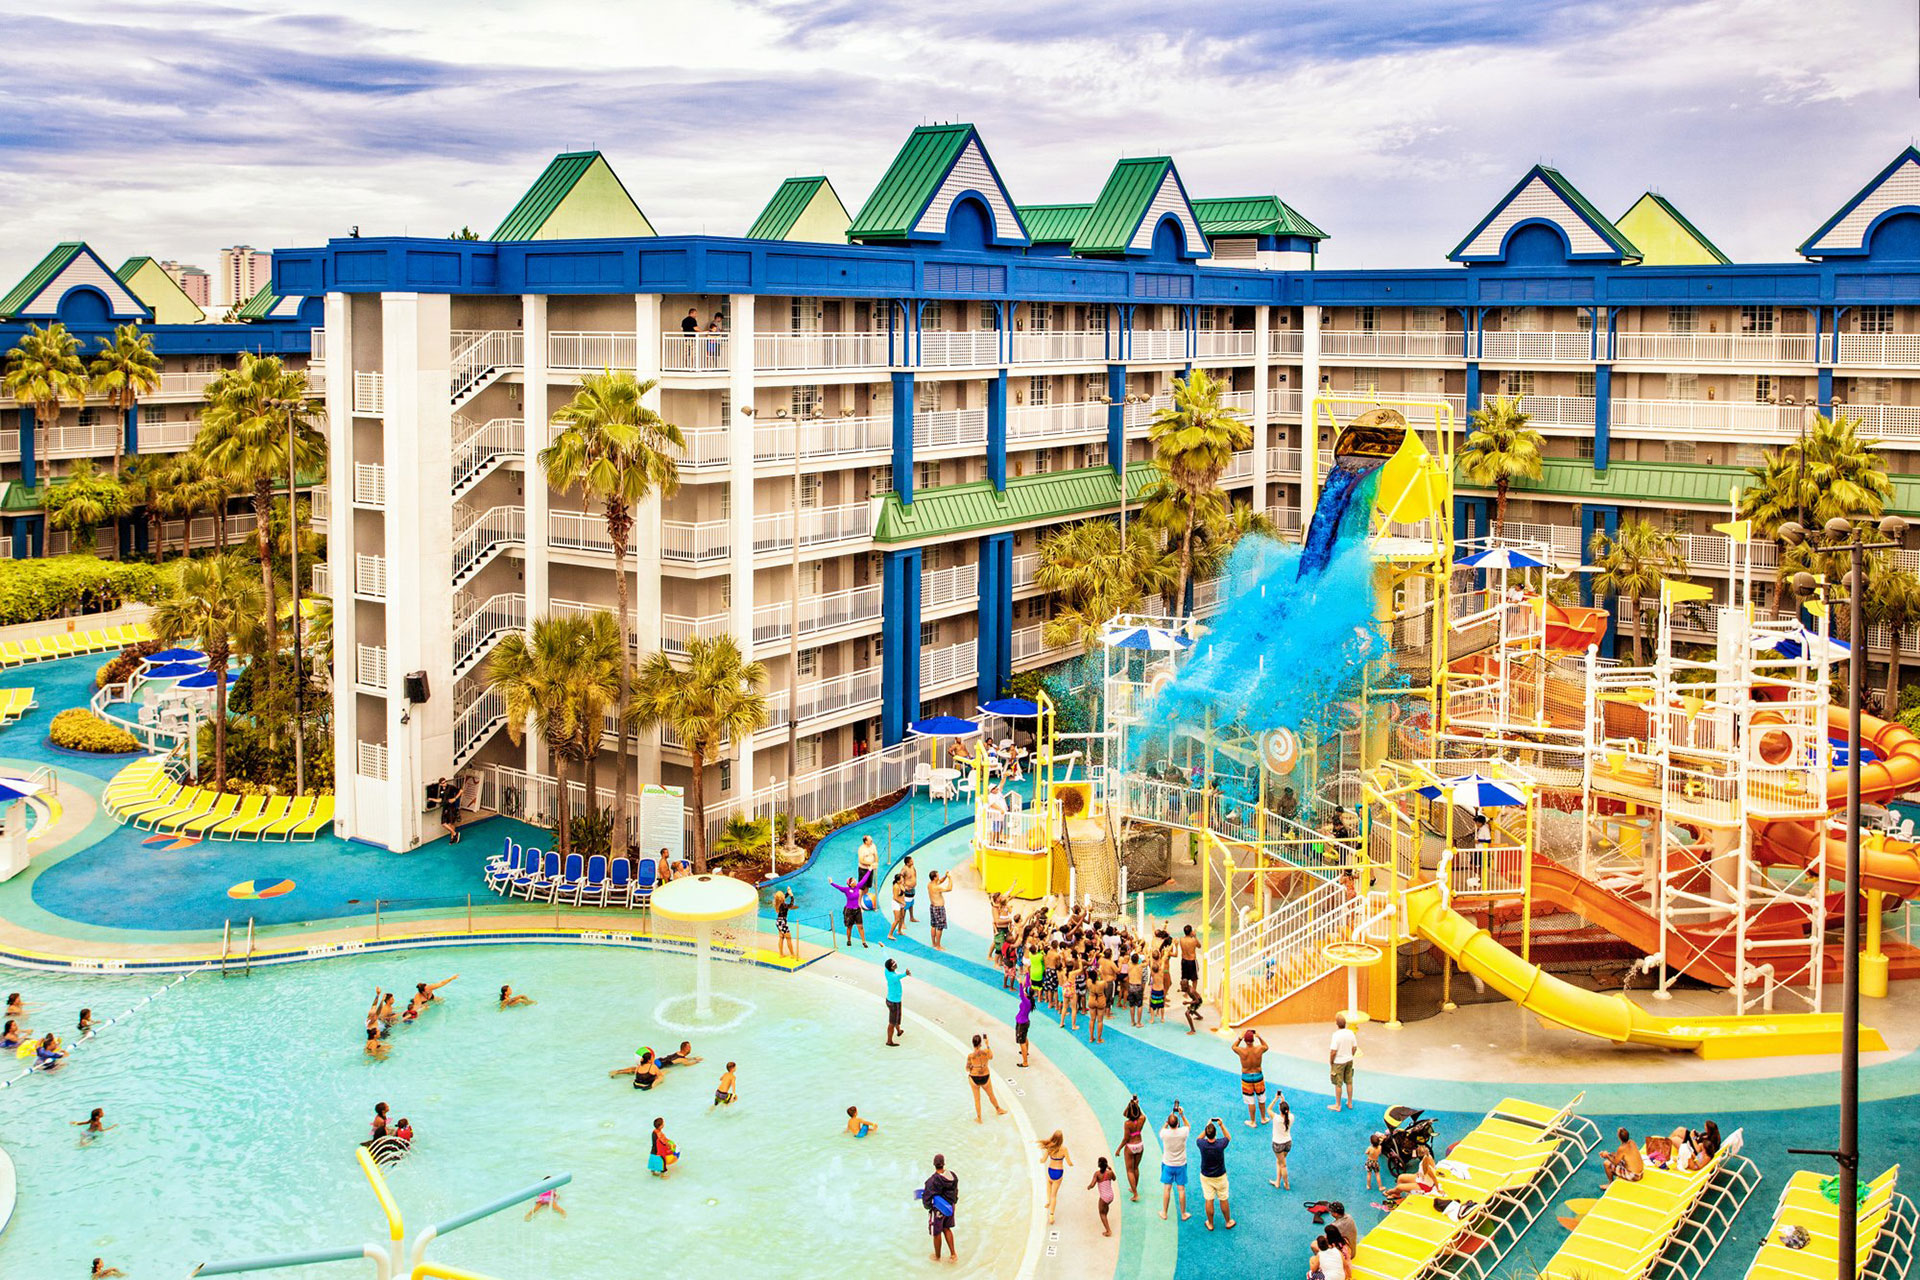 Aerial View of Holiday Inn Resort Orlando Suites – Waterpark